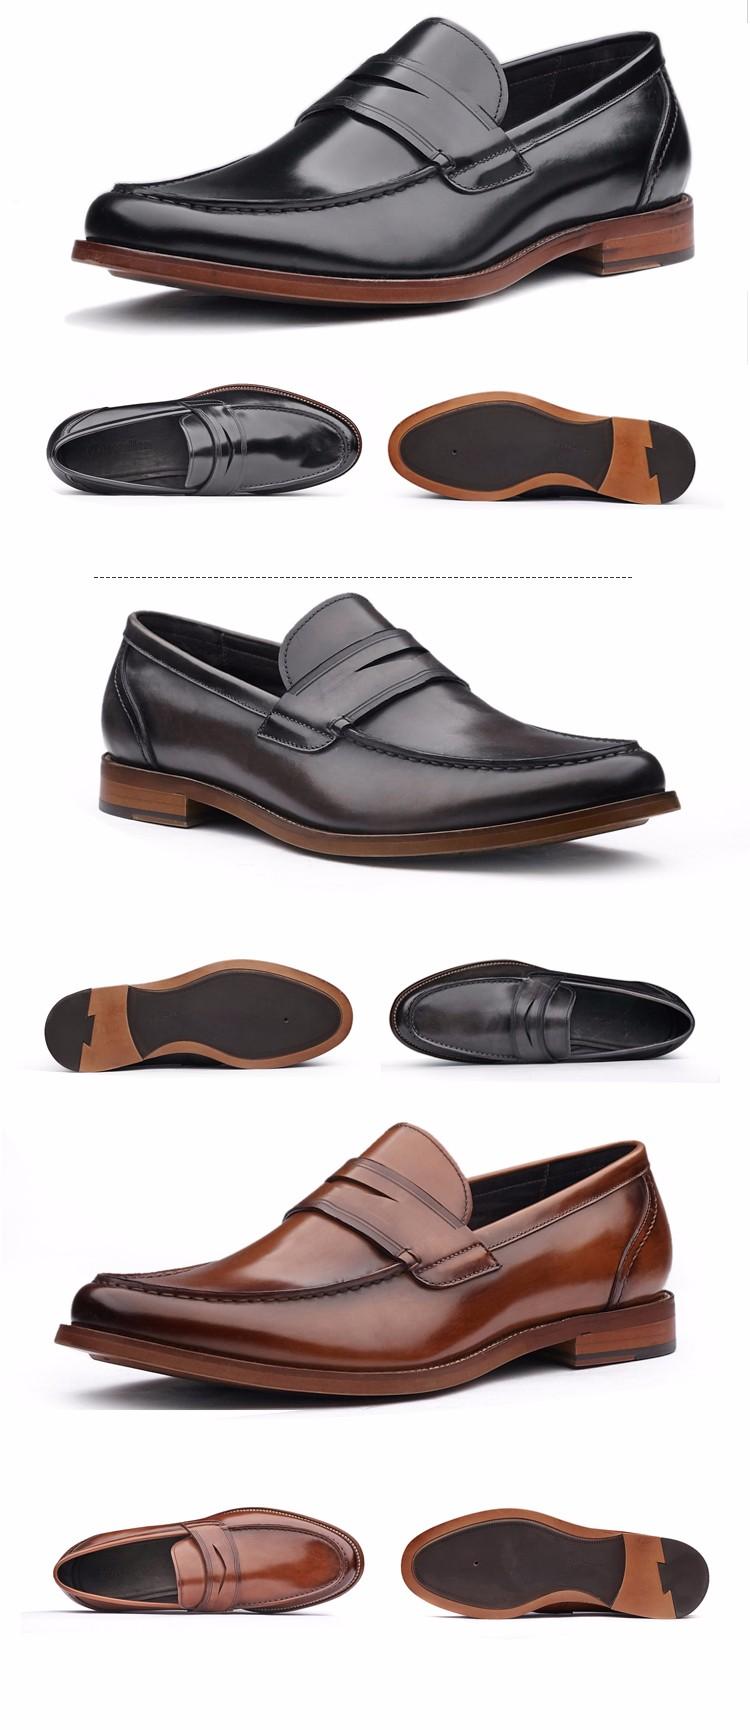 61024279f7f China factory italian wholesale fashion mens leather shoe latest formal  shoes man wedding dress shoes